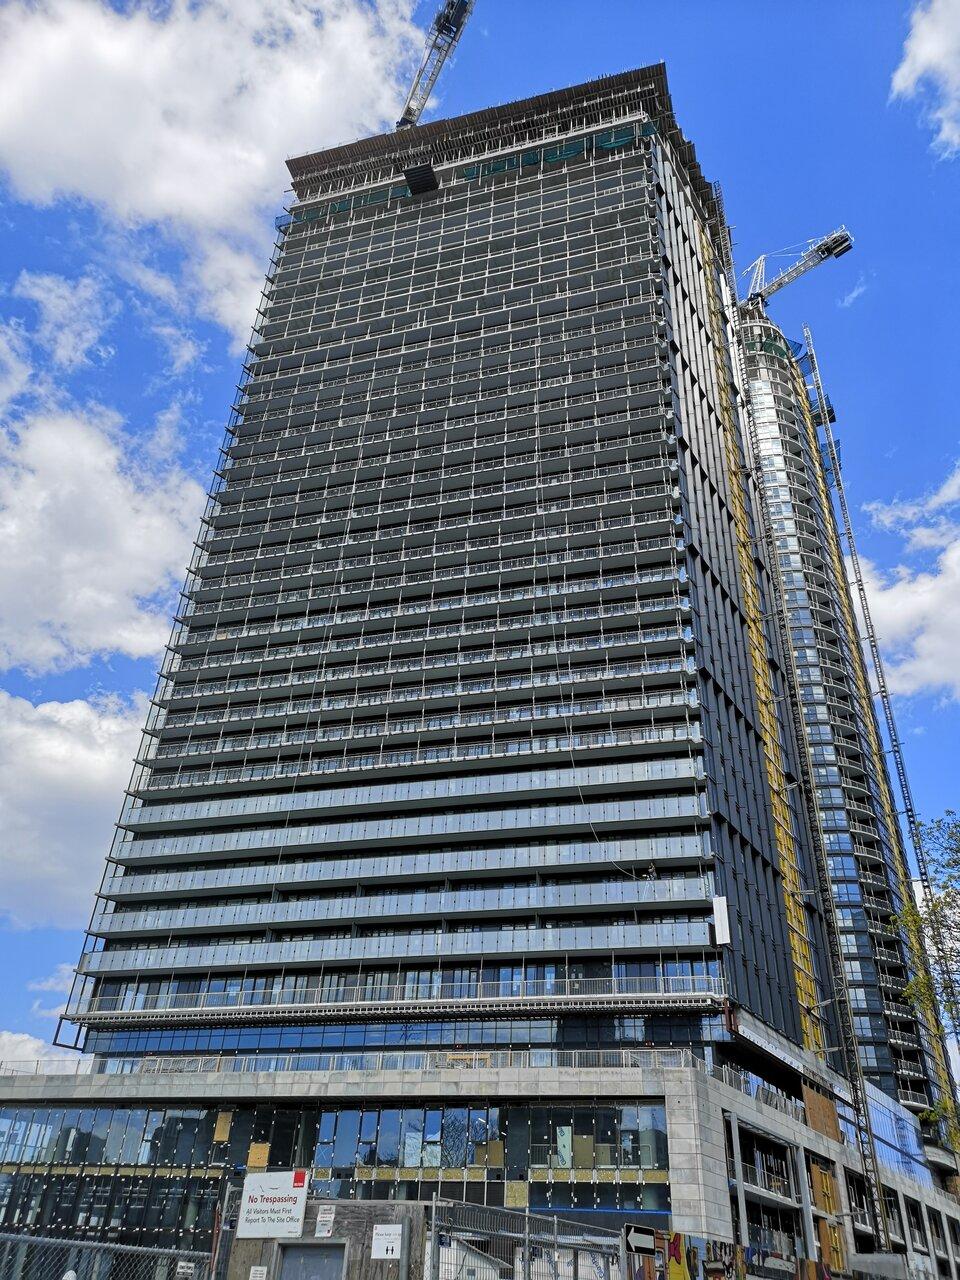 Via Bloor, Tridel, architects—Alliance, Toronto